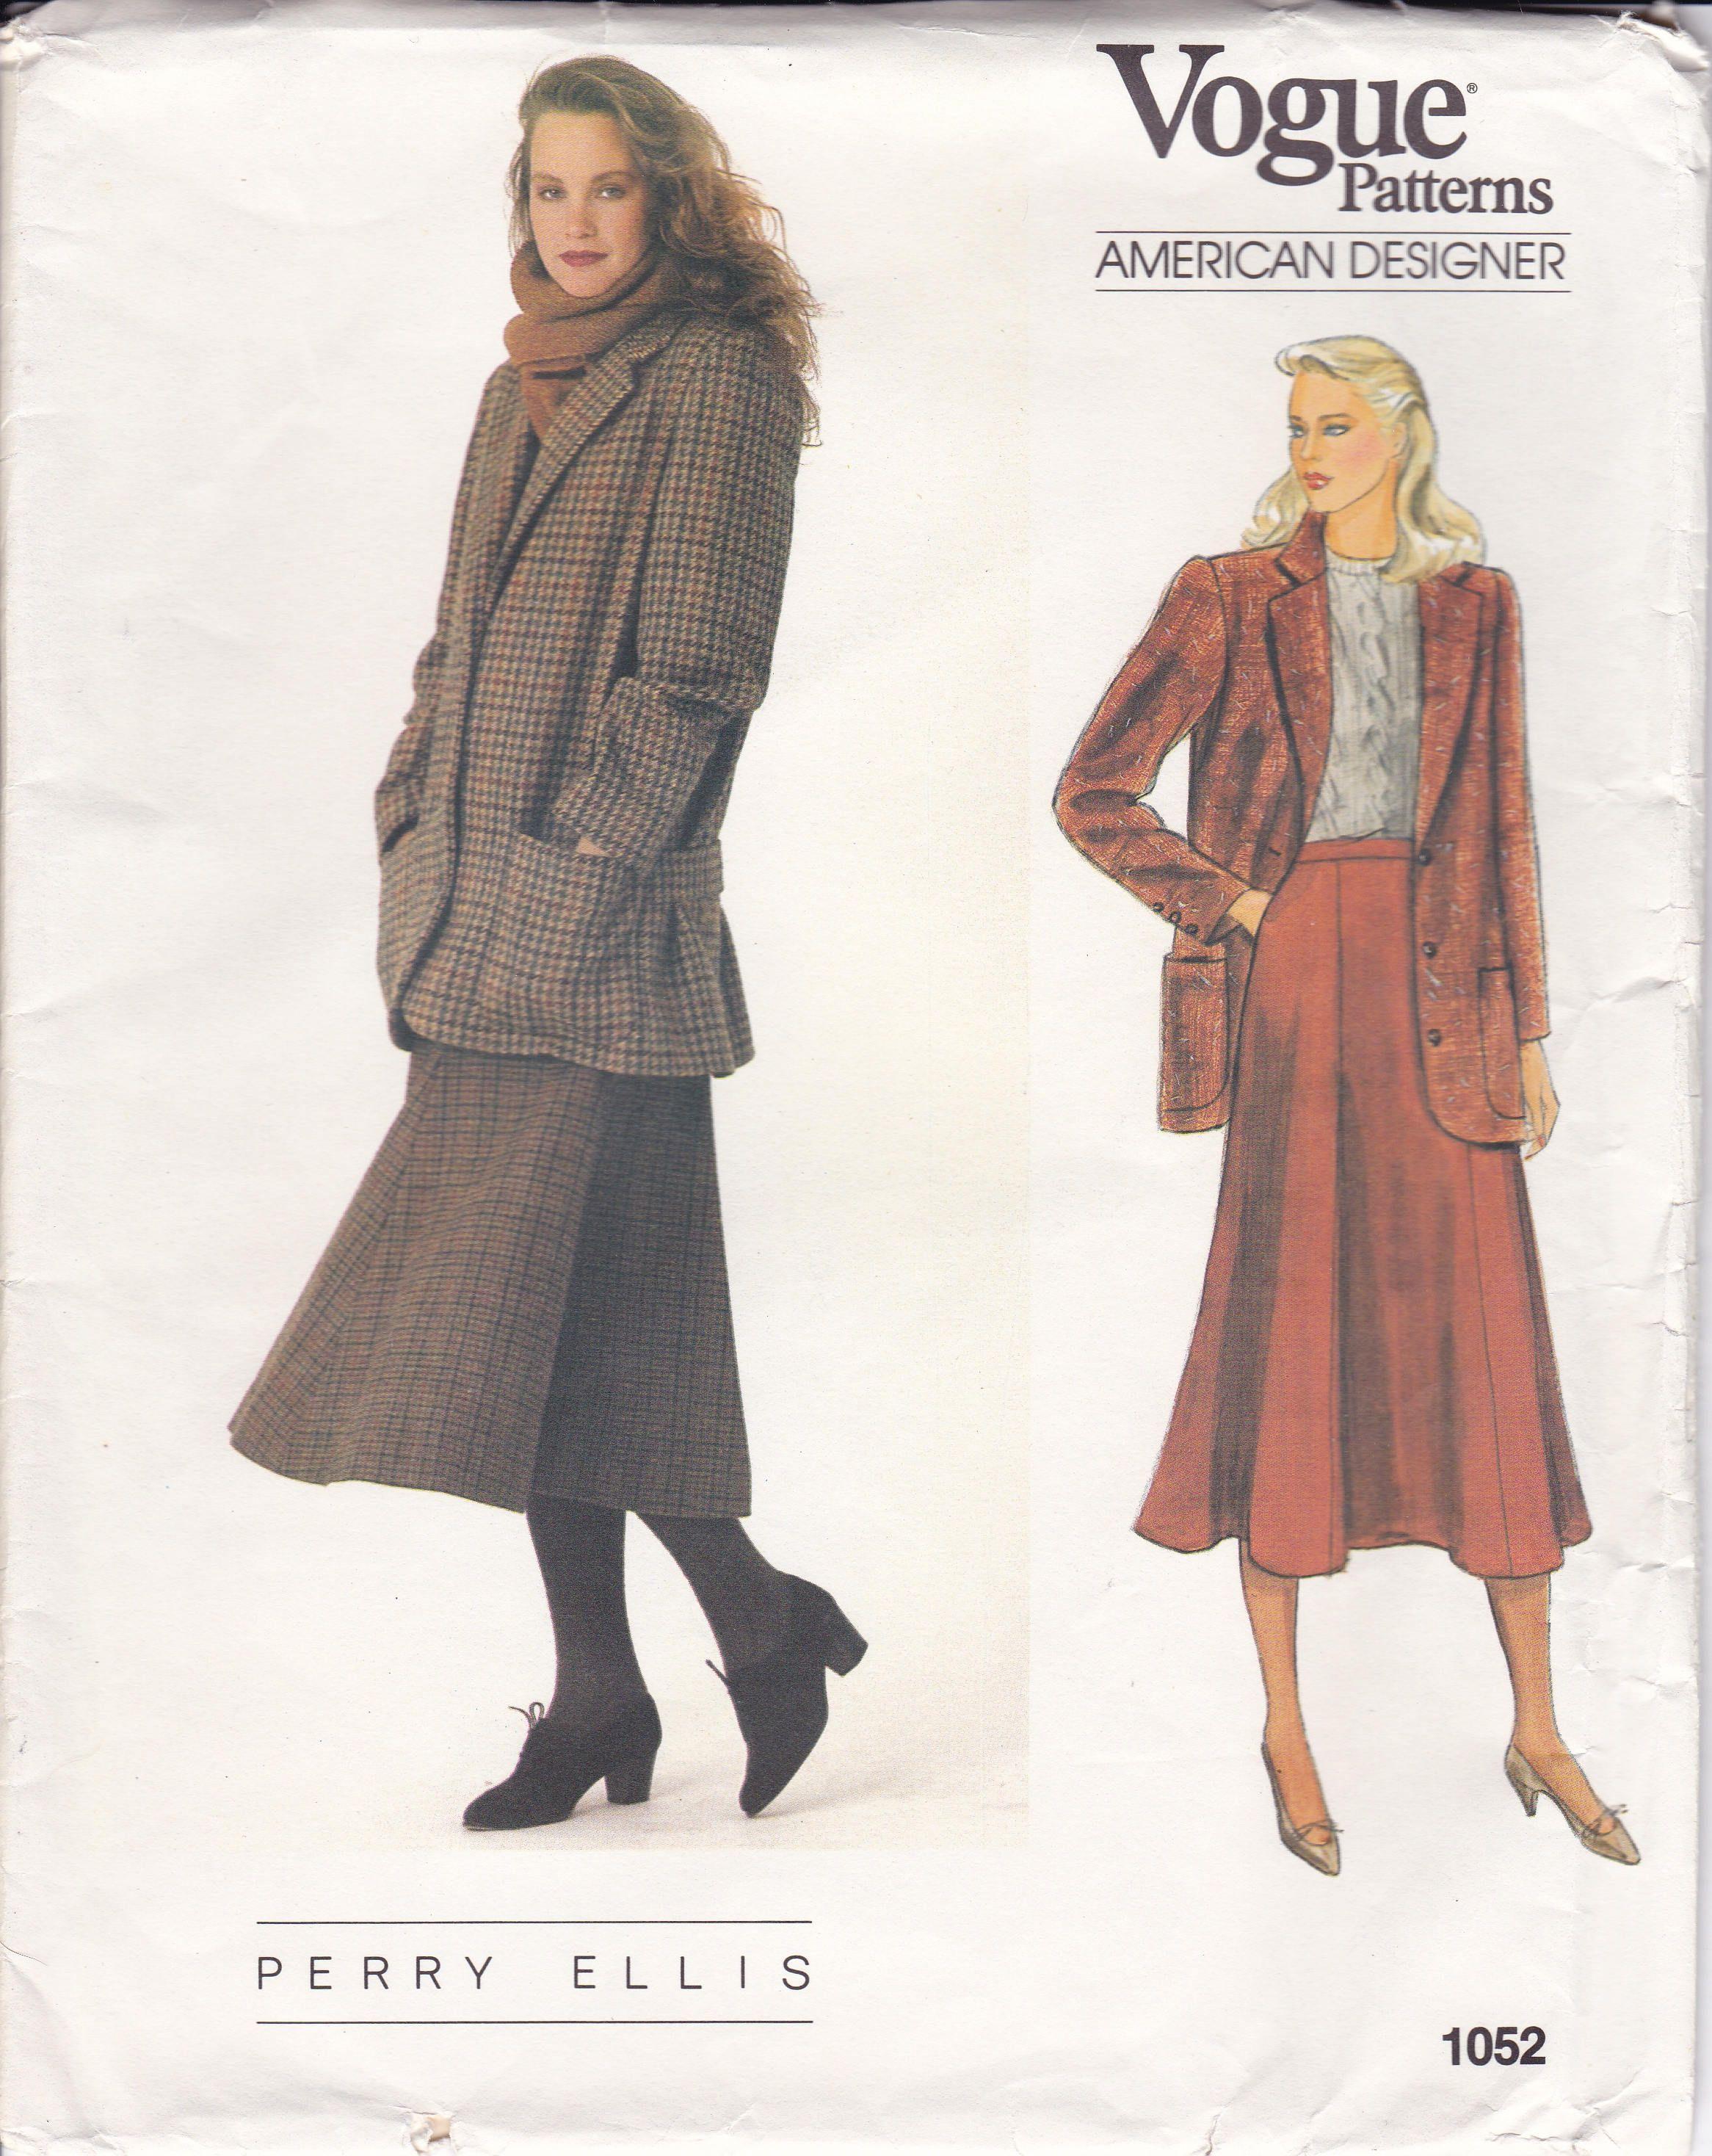 Free Us Ship Sewing Pattern Vogue 1052 Vintage Retro 1980s 80s ...